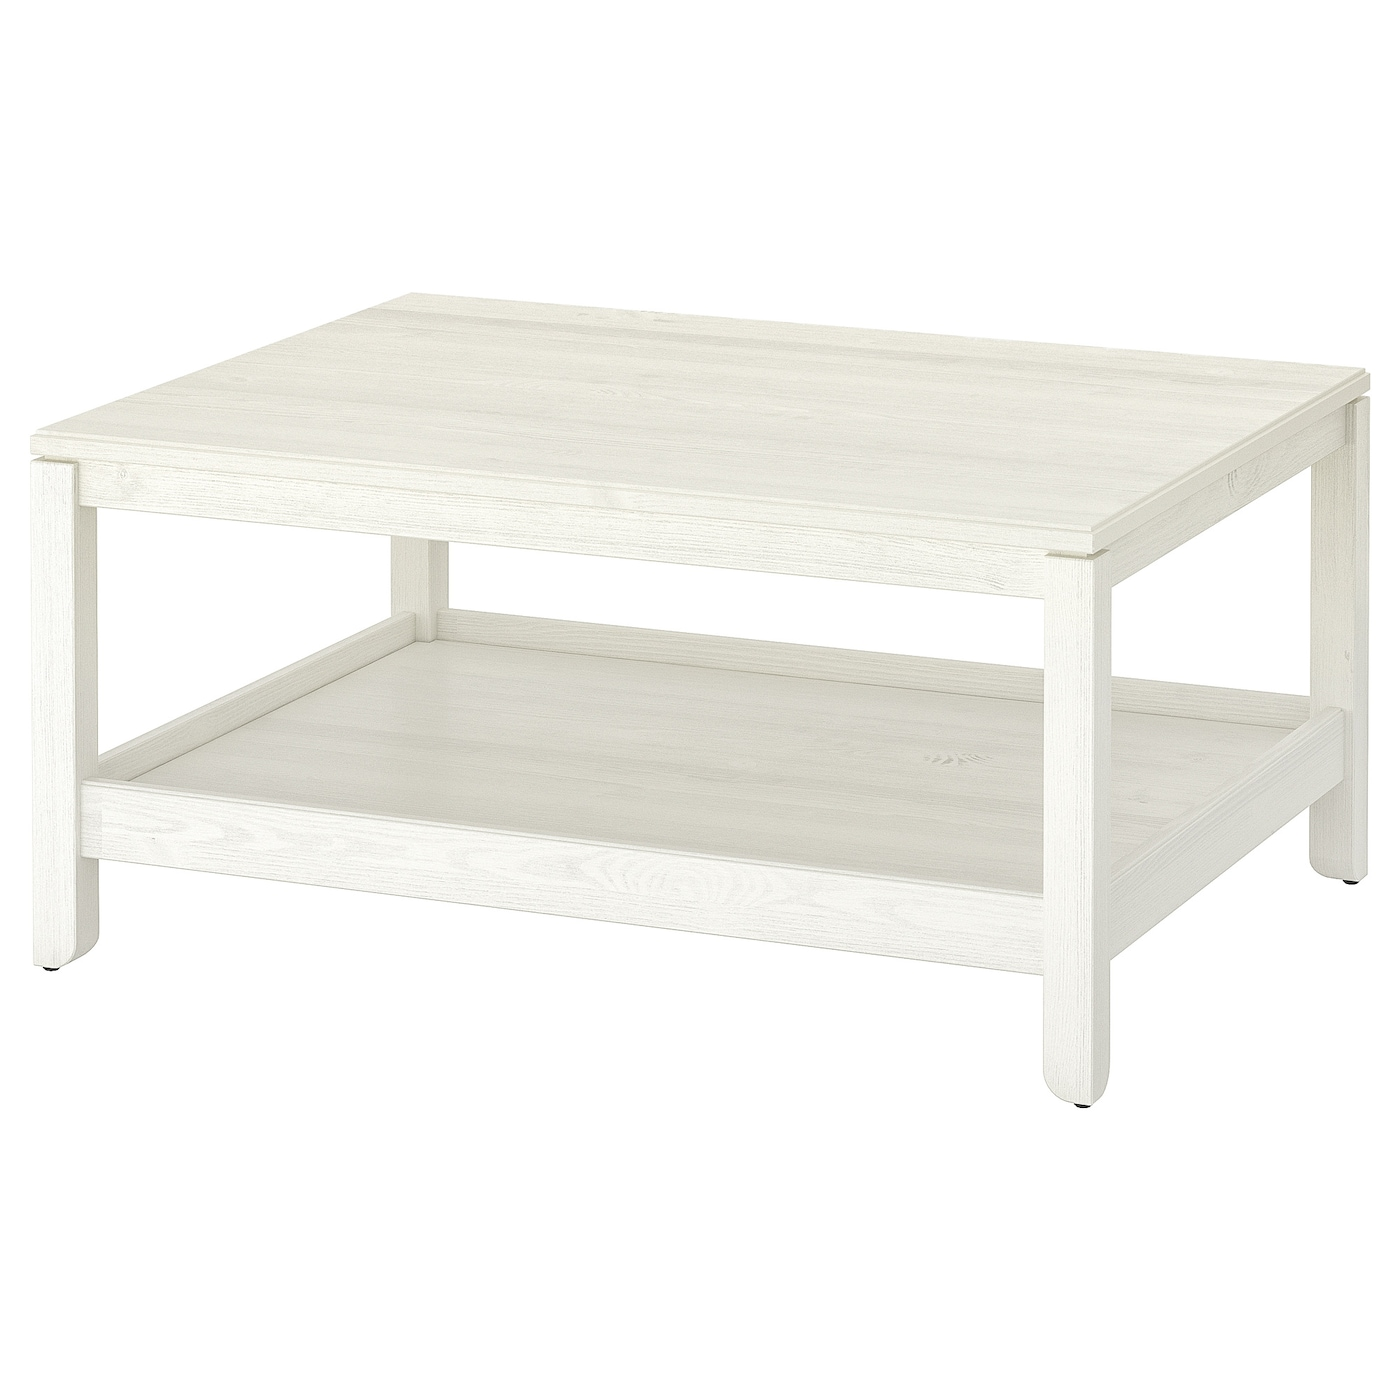 Havsta Table Basse Blanc 100x75 Cm Ikea